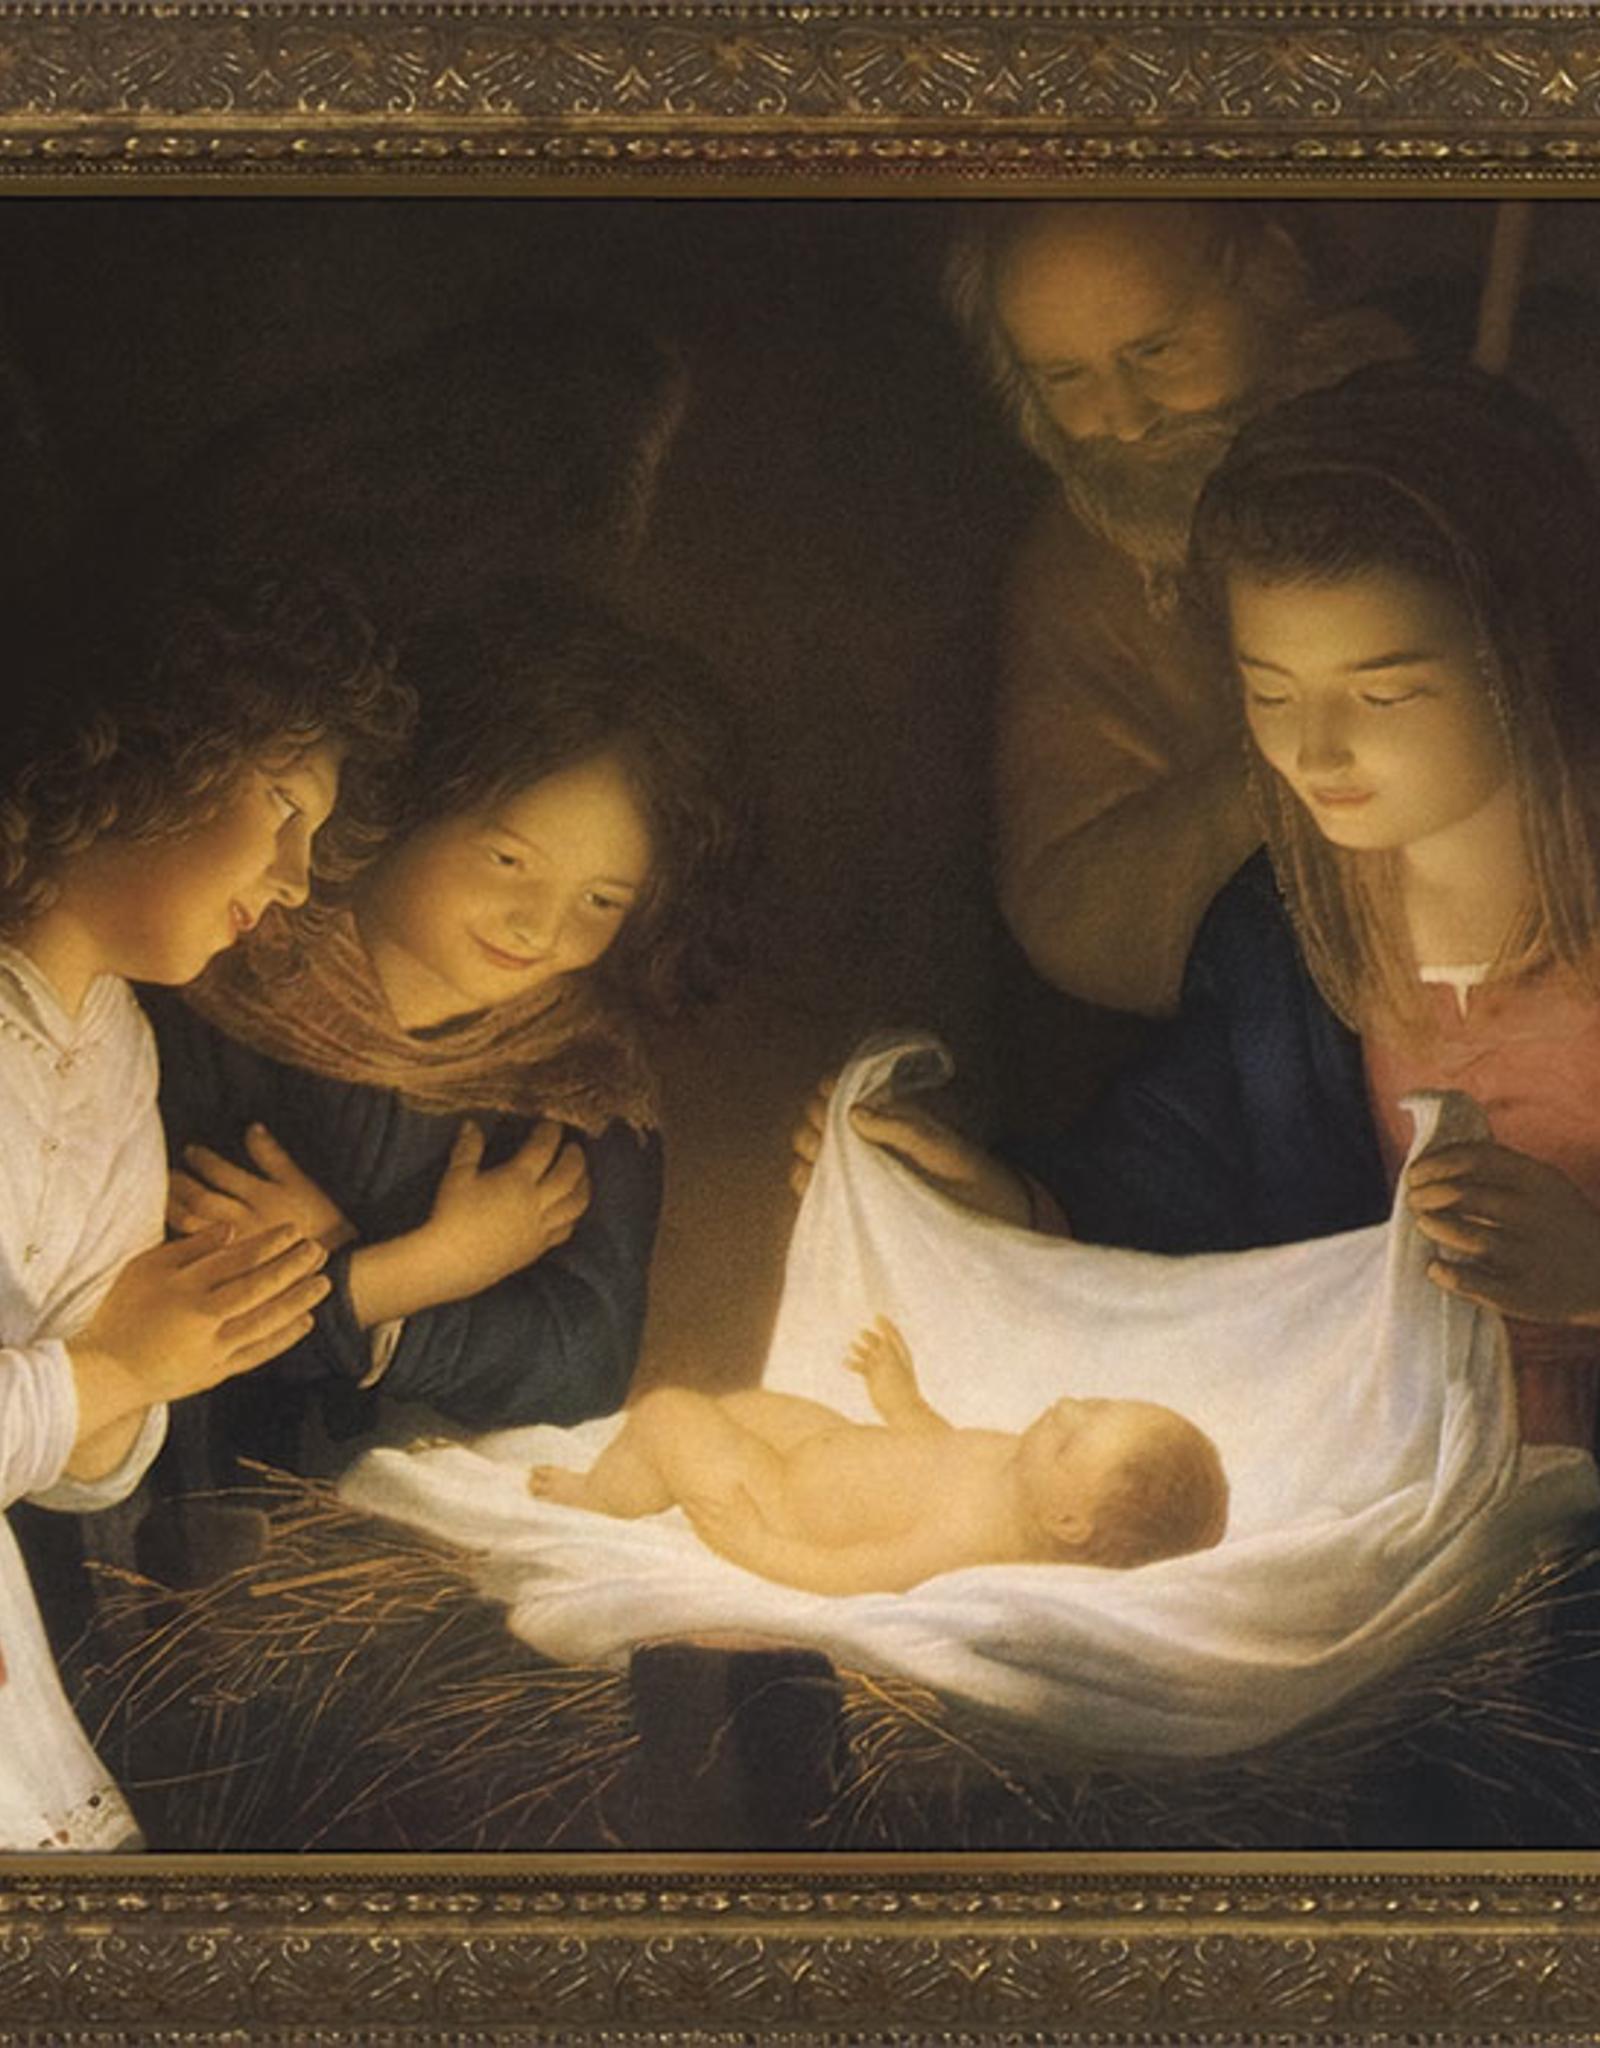 "Nelson/Catholic to the Max Nativity Framed Image Ornate Gold Frame 12 x 16"""